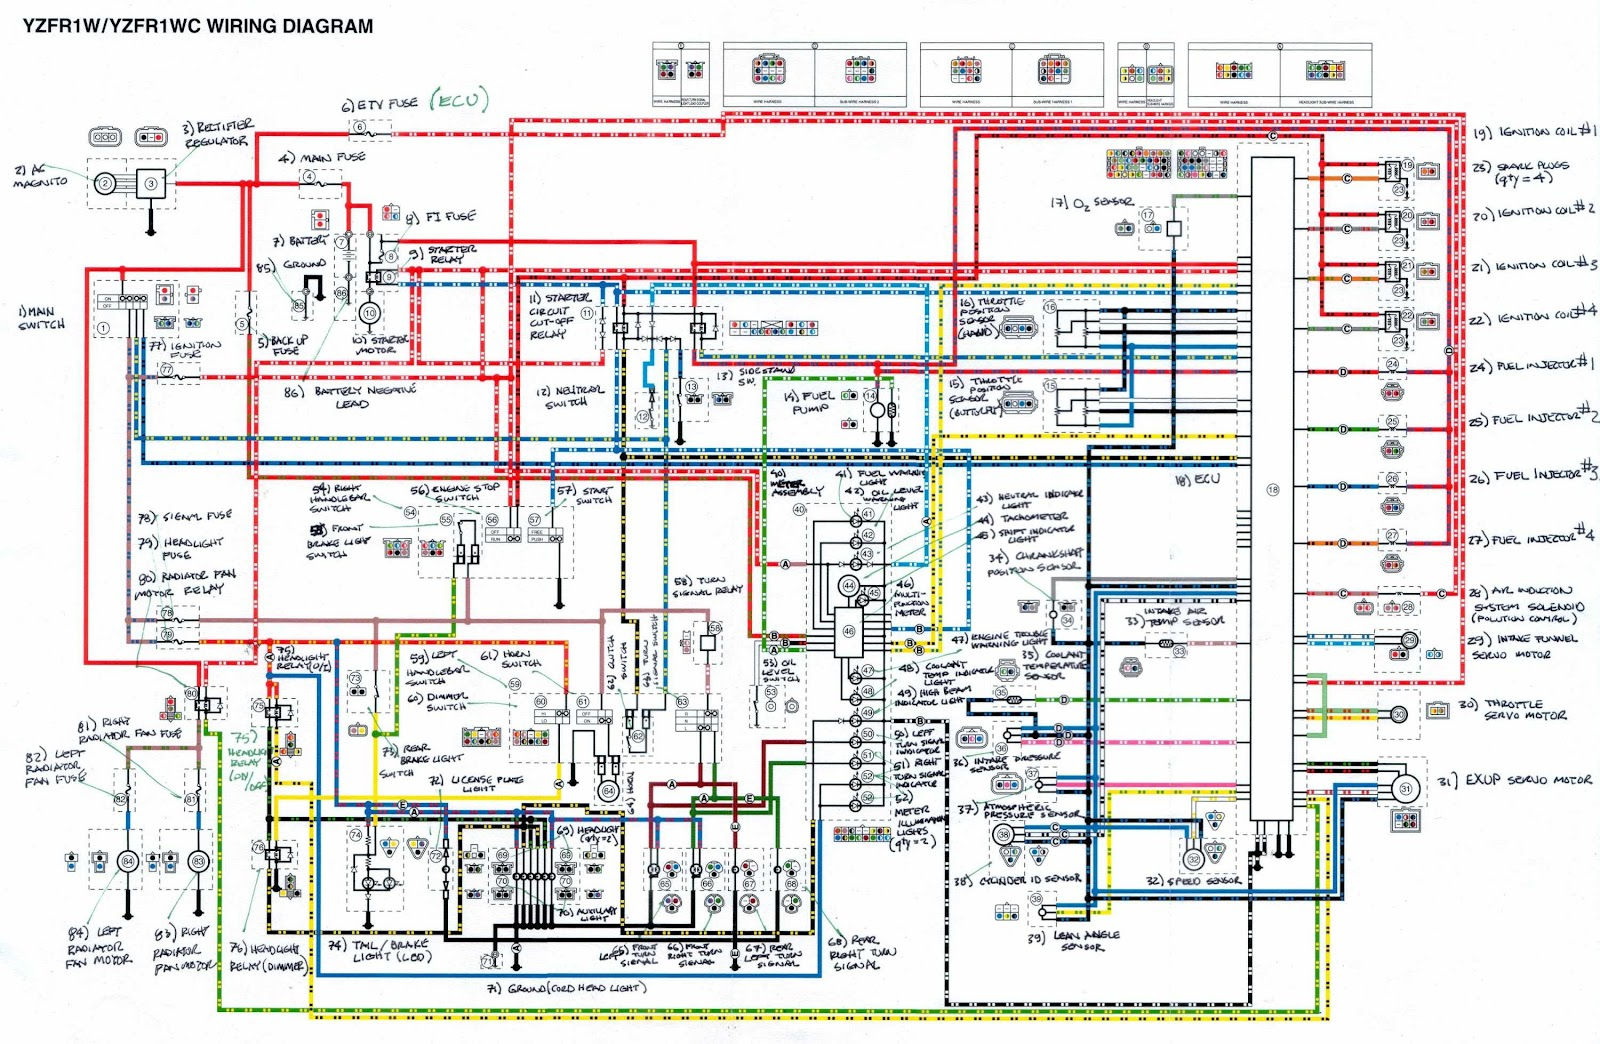 wiring diagram for triumph tr7 1976 6 1980 mgb wiring diagram wiring diagram for [ 1600 x 1044 Pixel ]